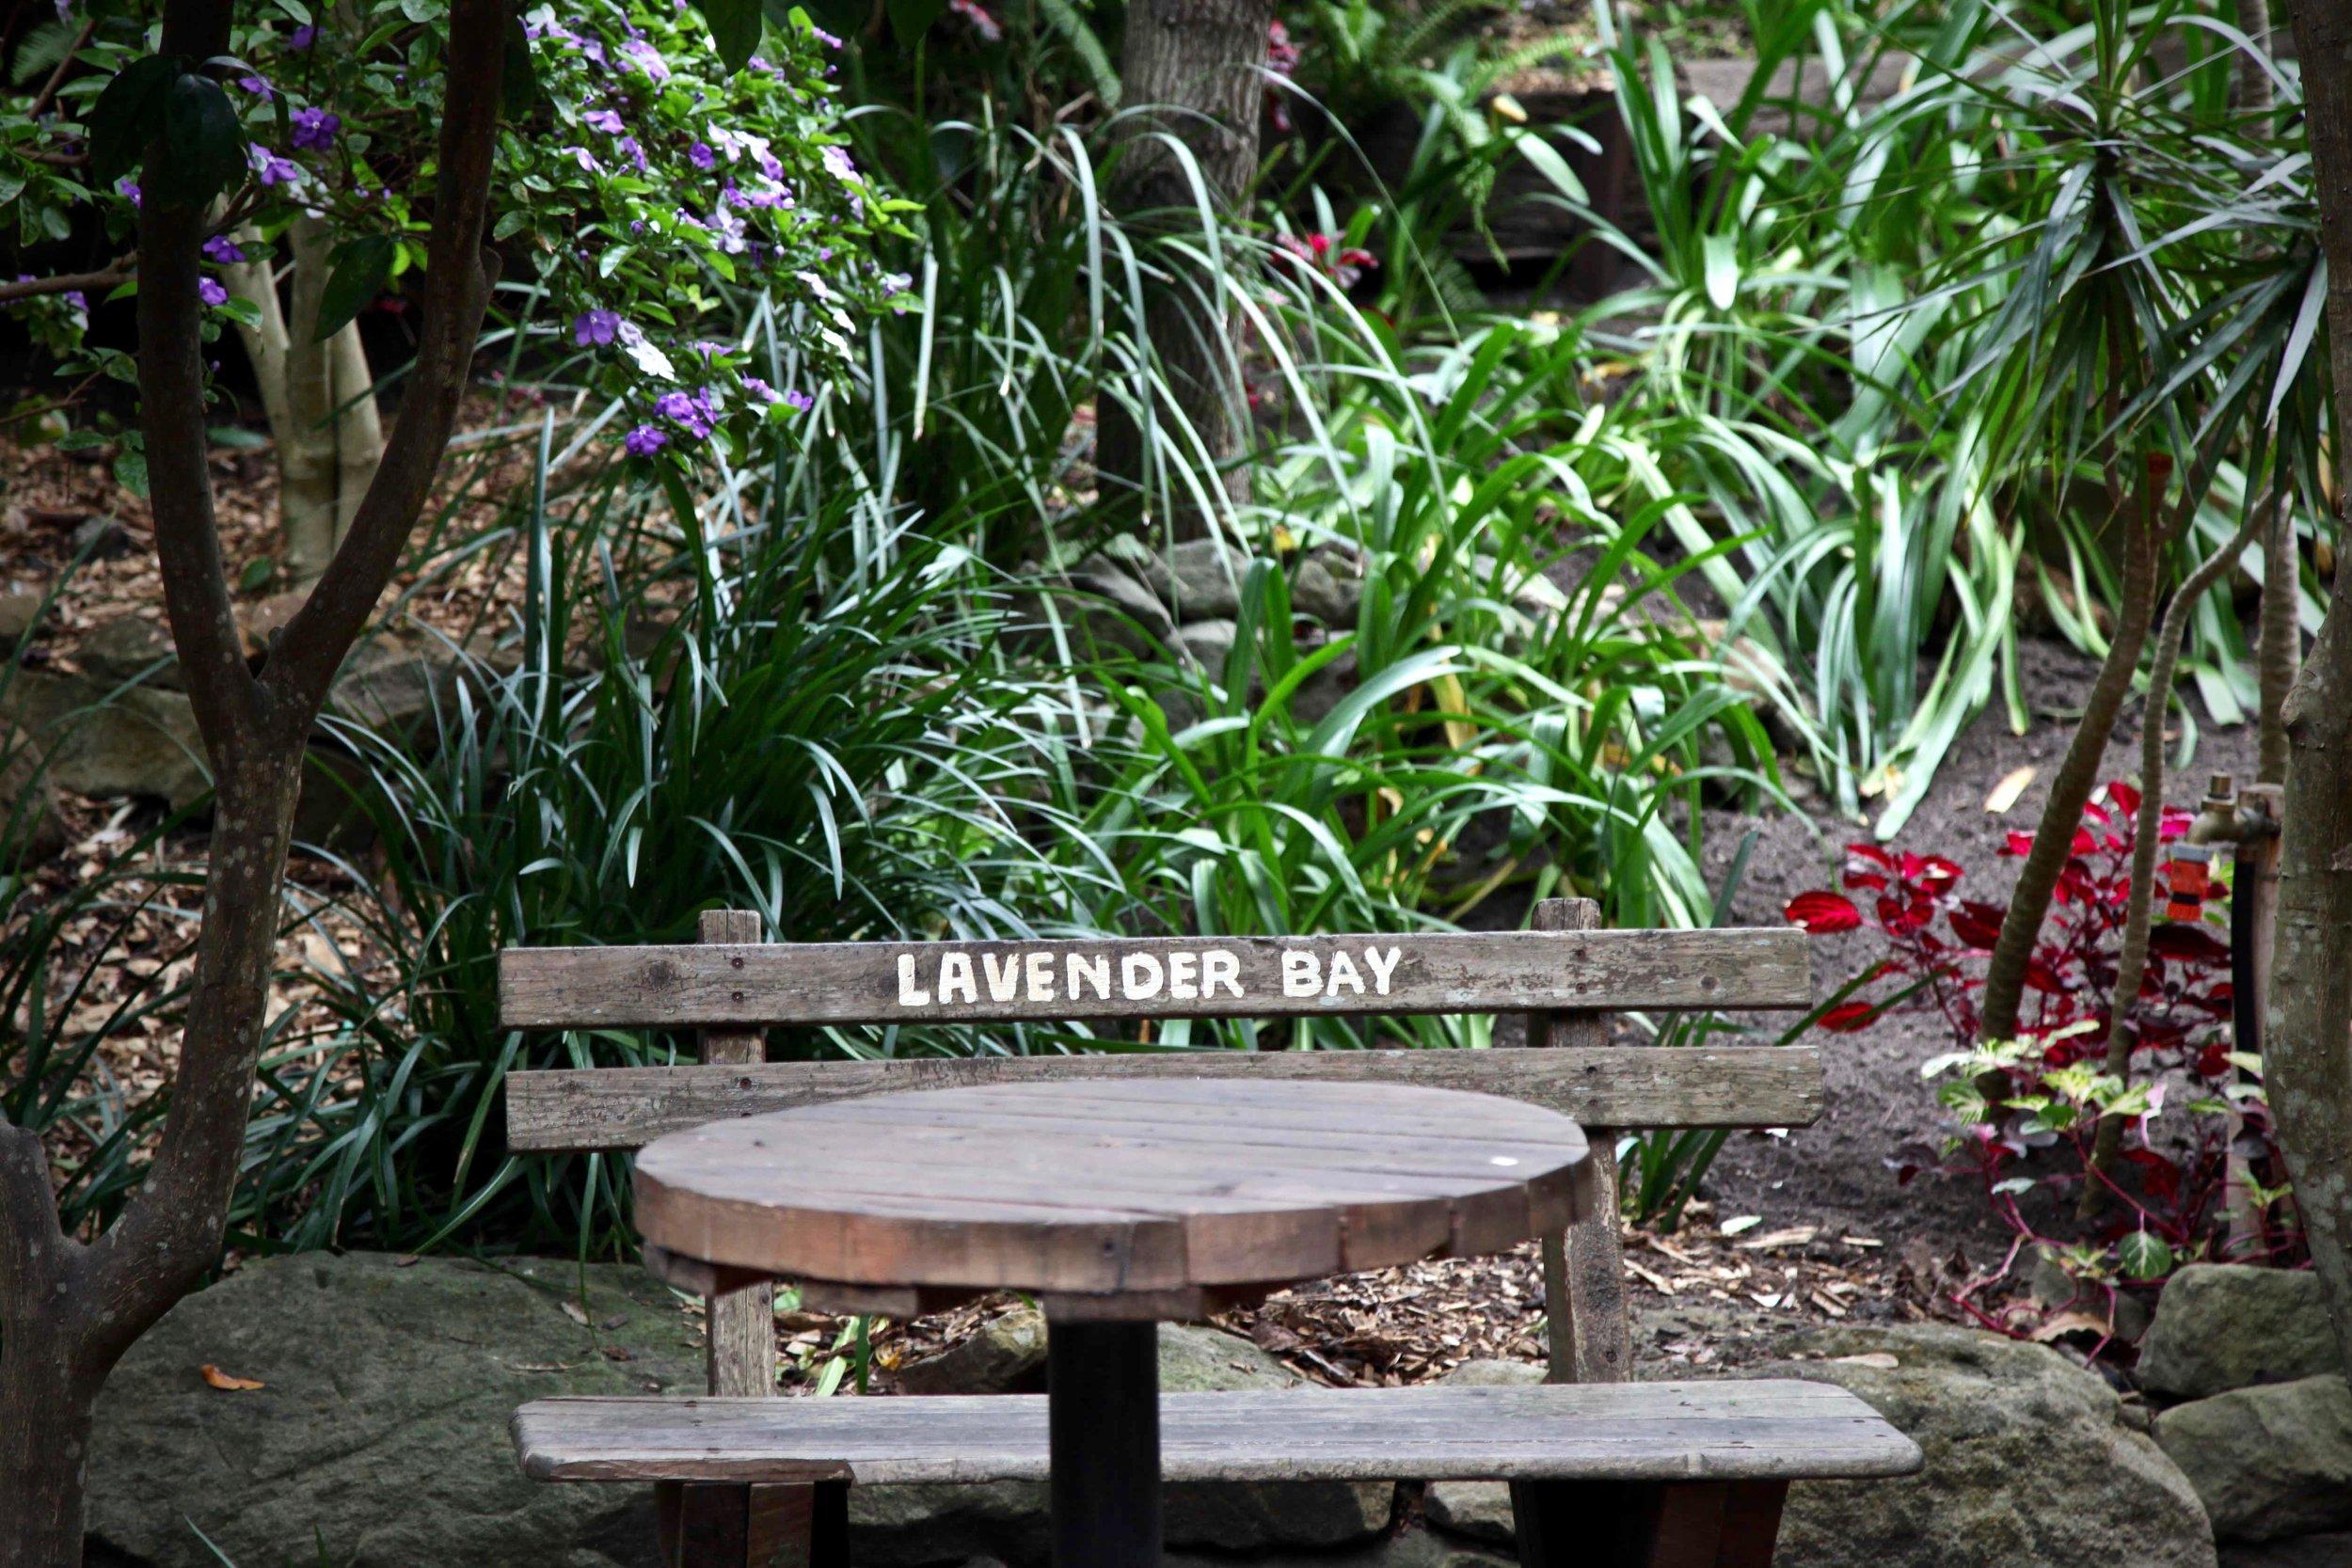 Wendy's not-so-secret garden at Lavender Bay.